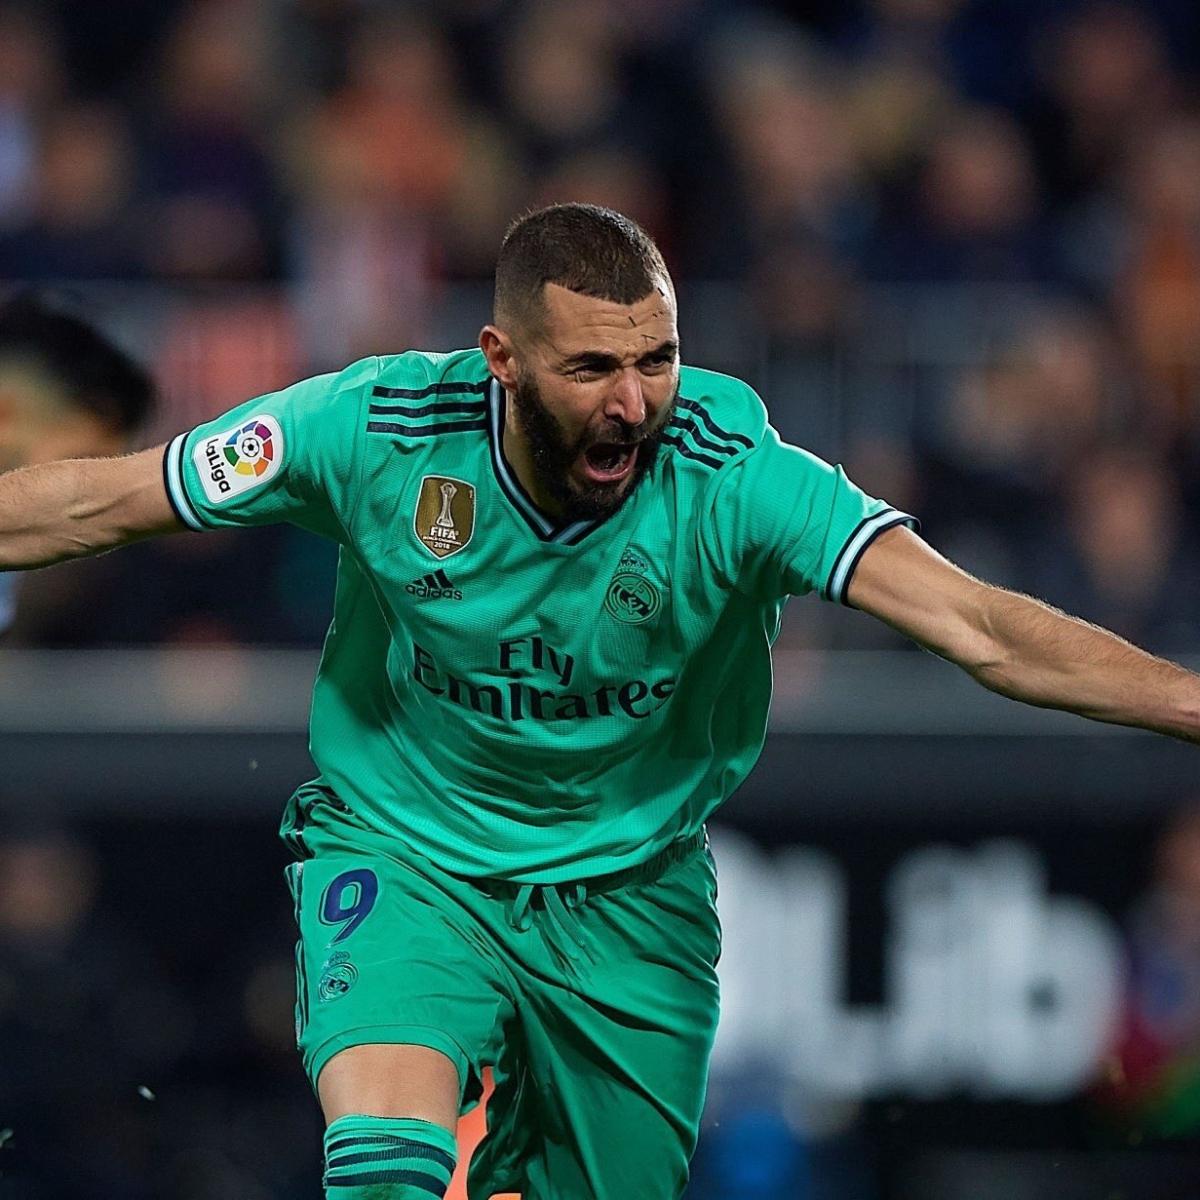 La Liga Highlights: Karim Benzema stars in Real Madrid's 8th straight victory